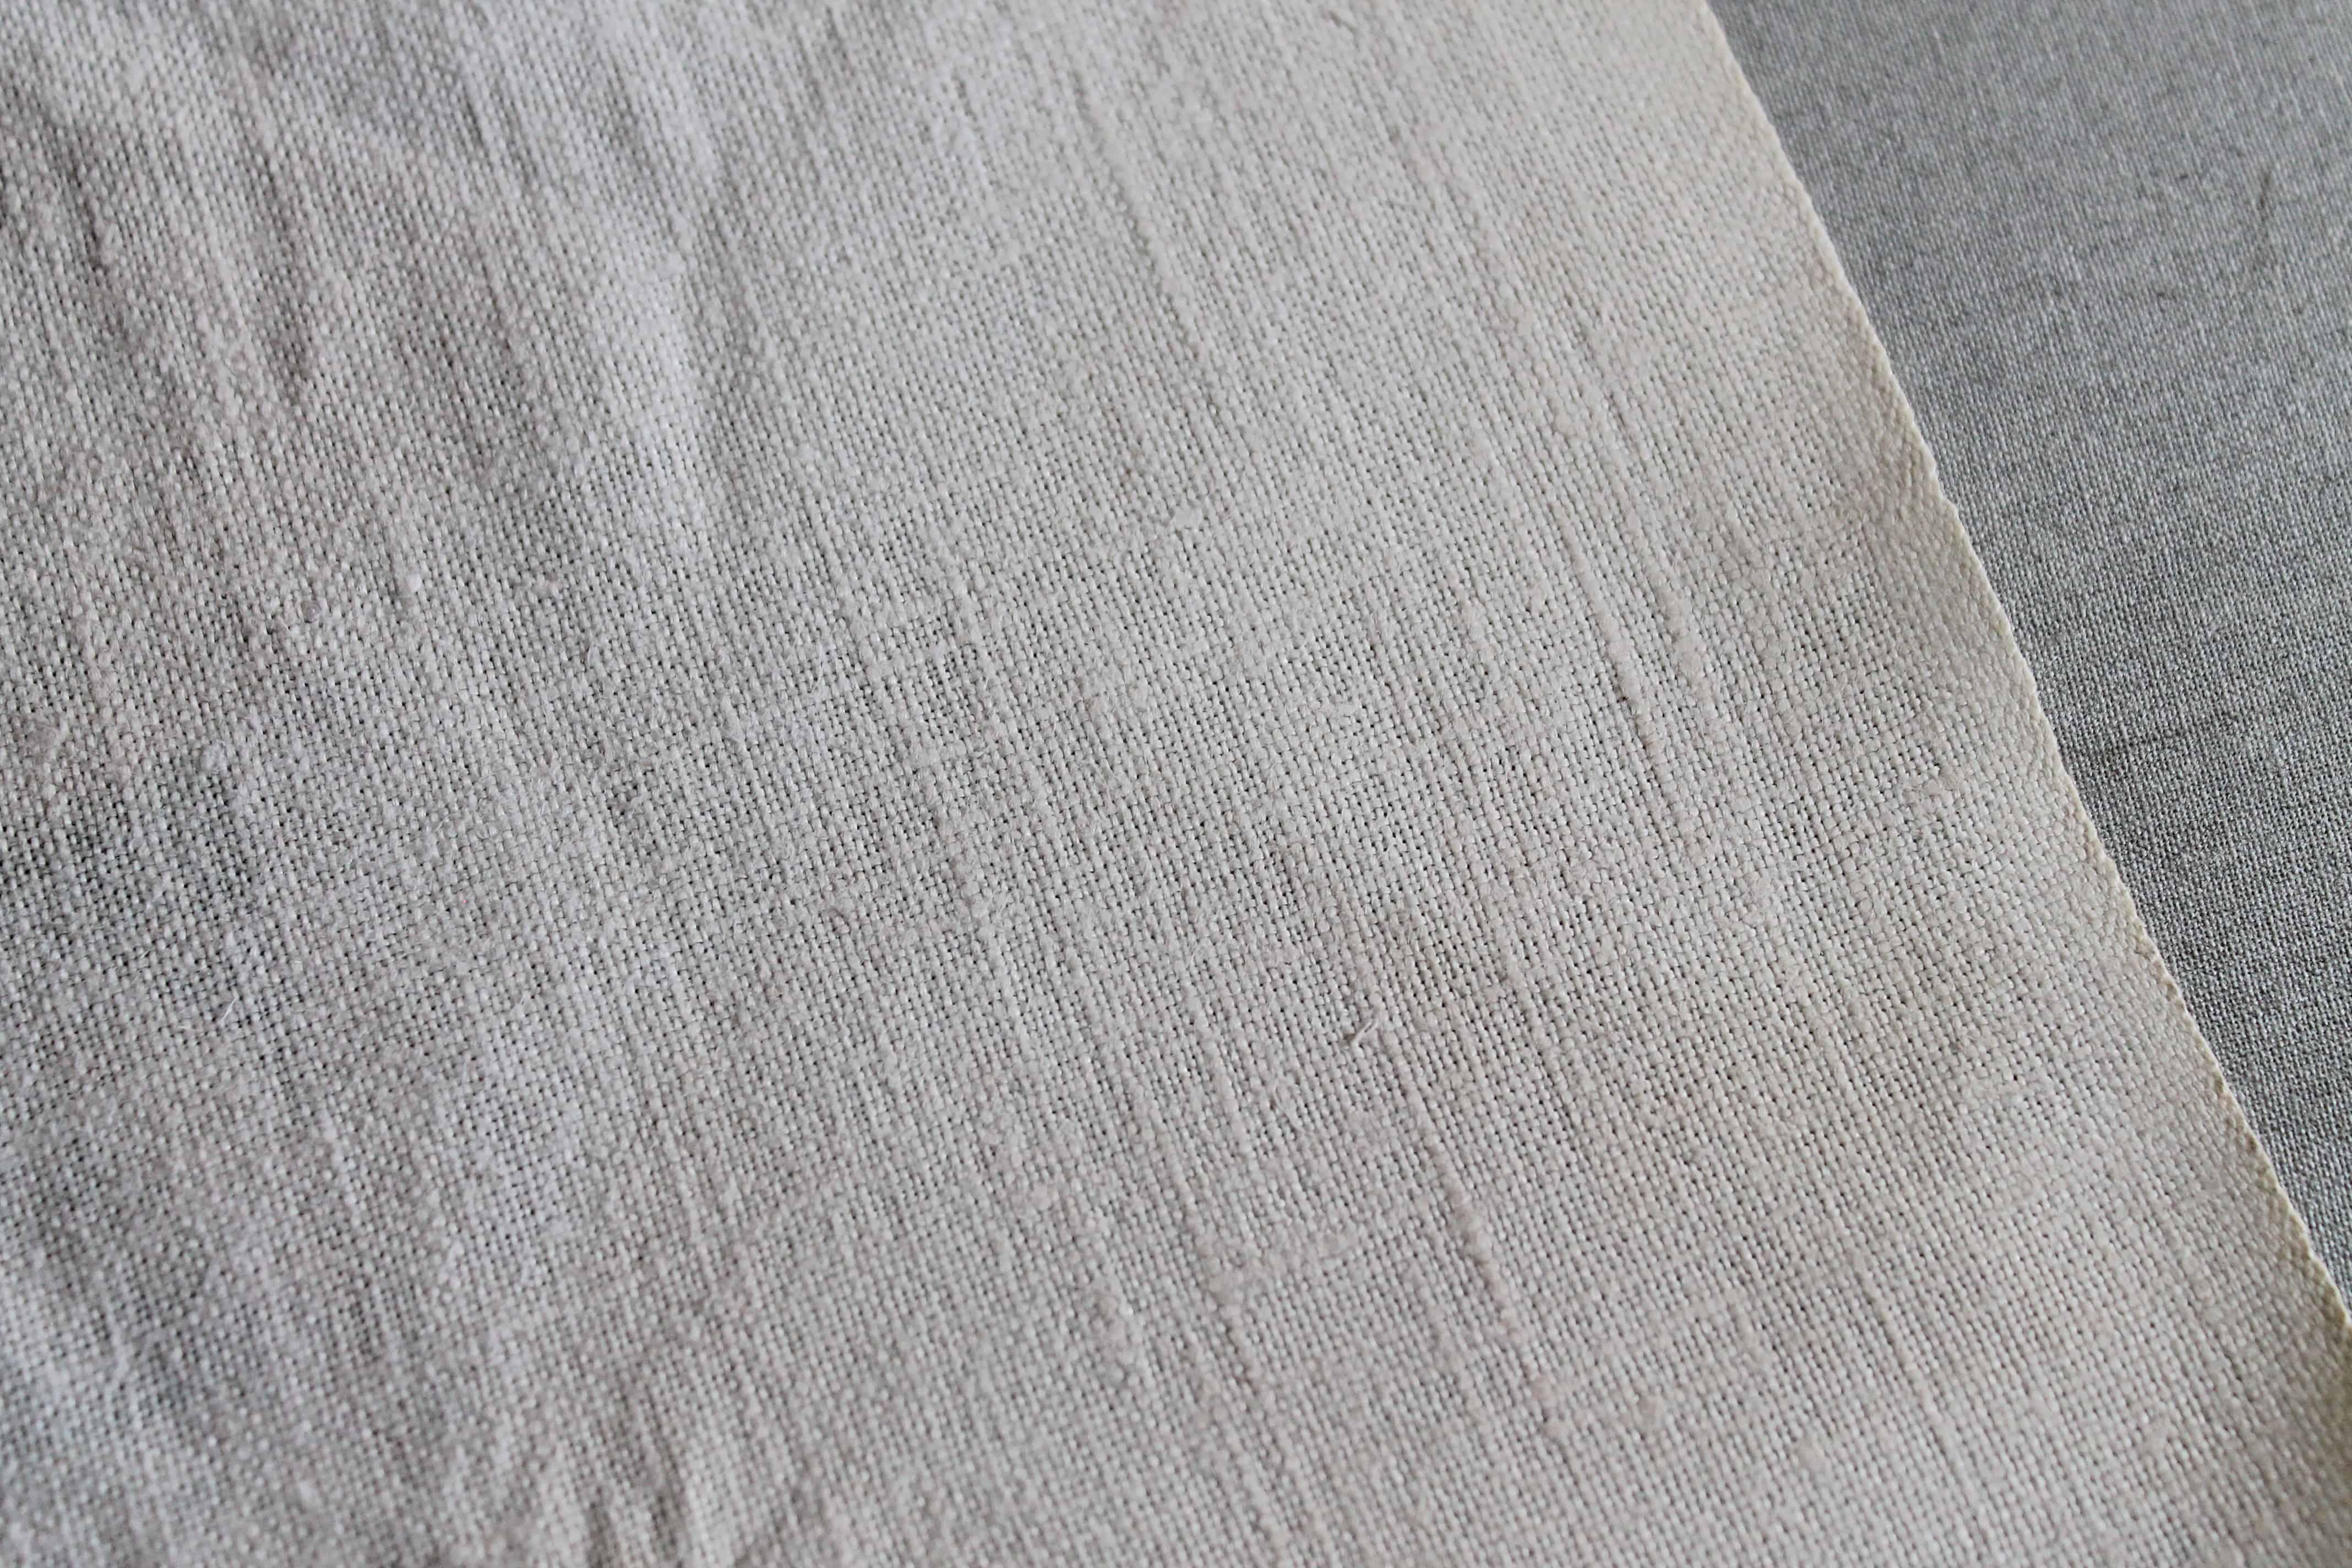 Scorch mark gone on linen